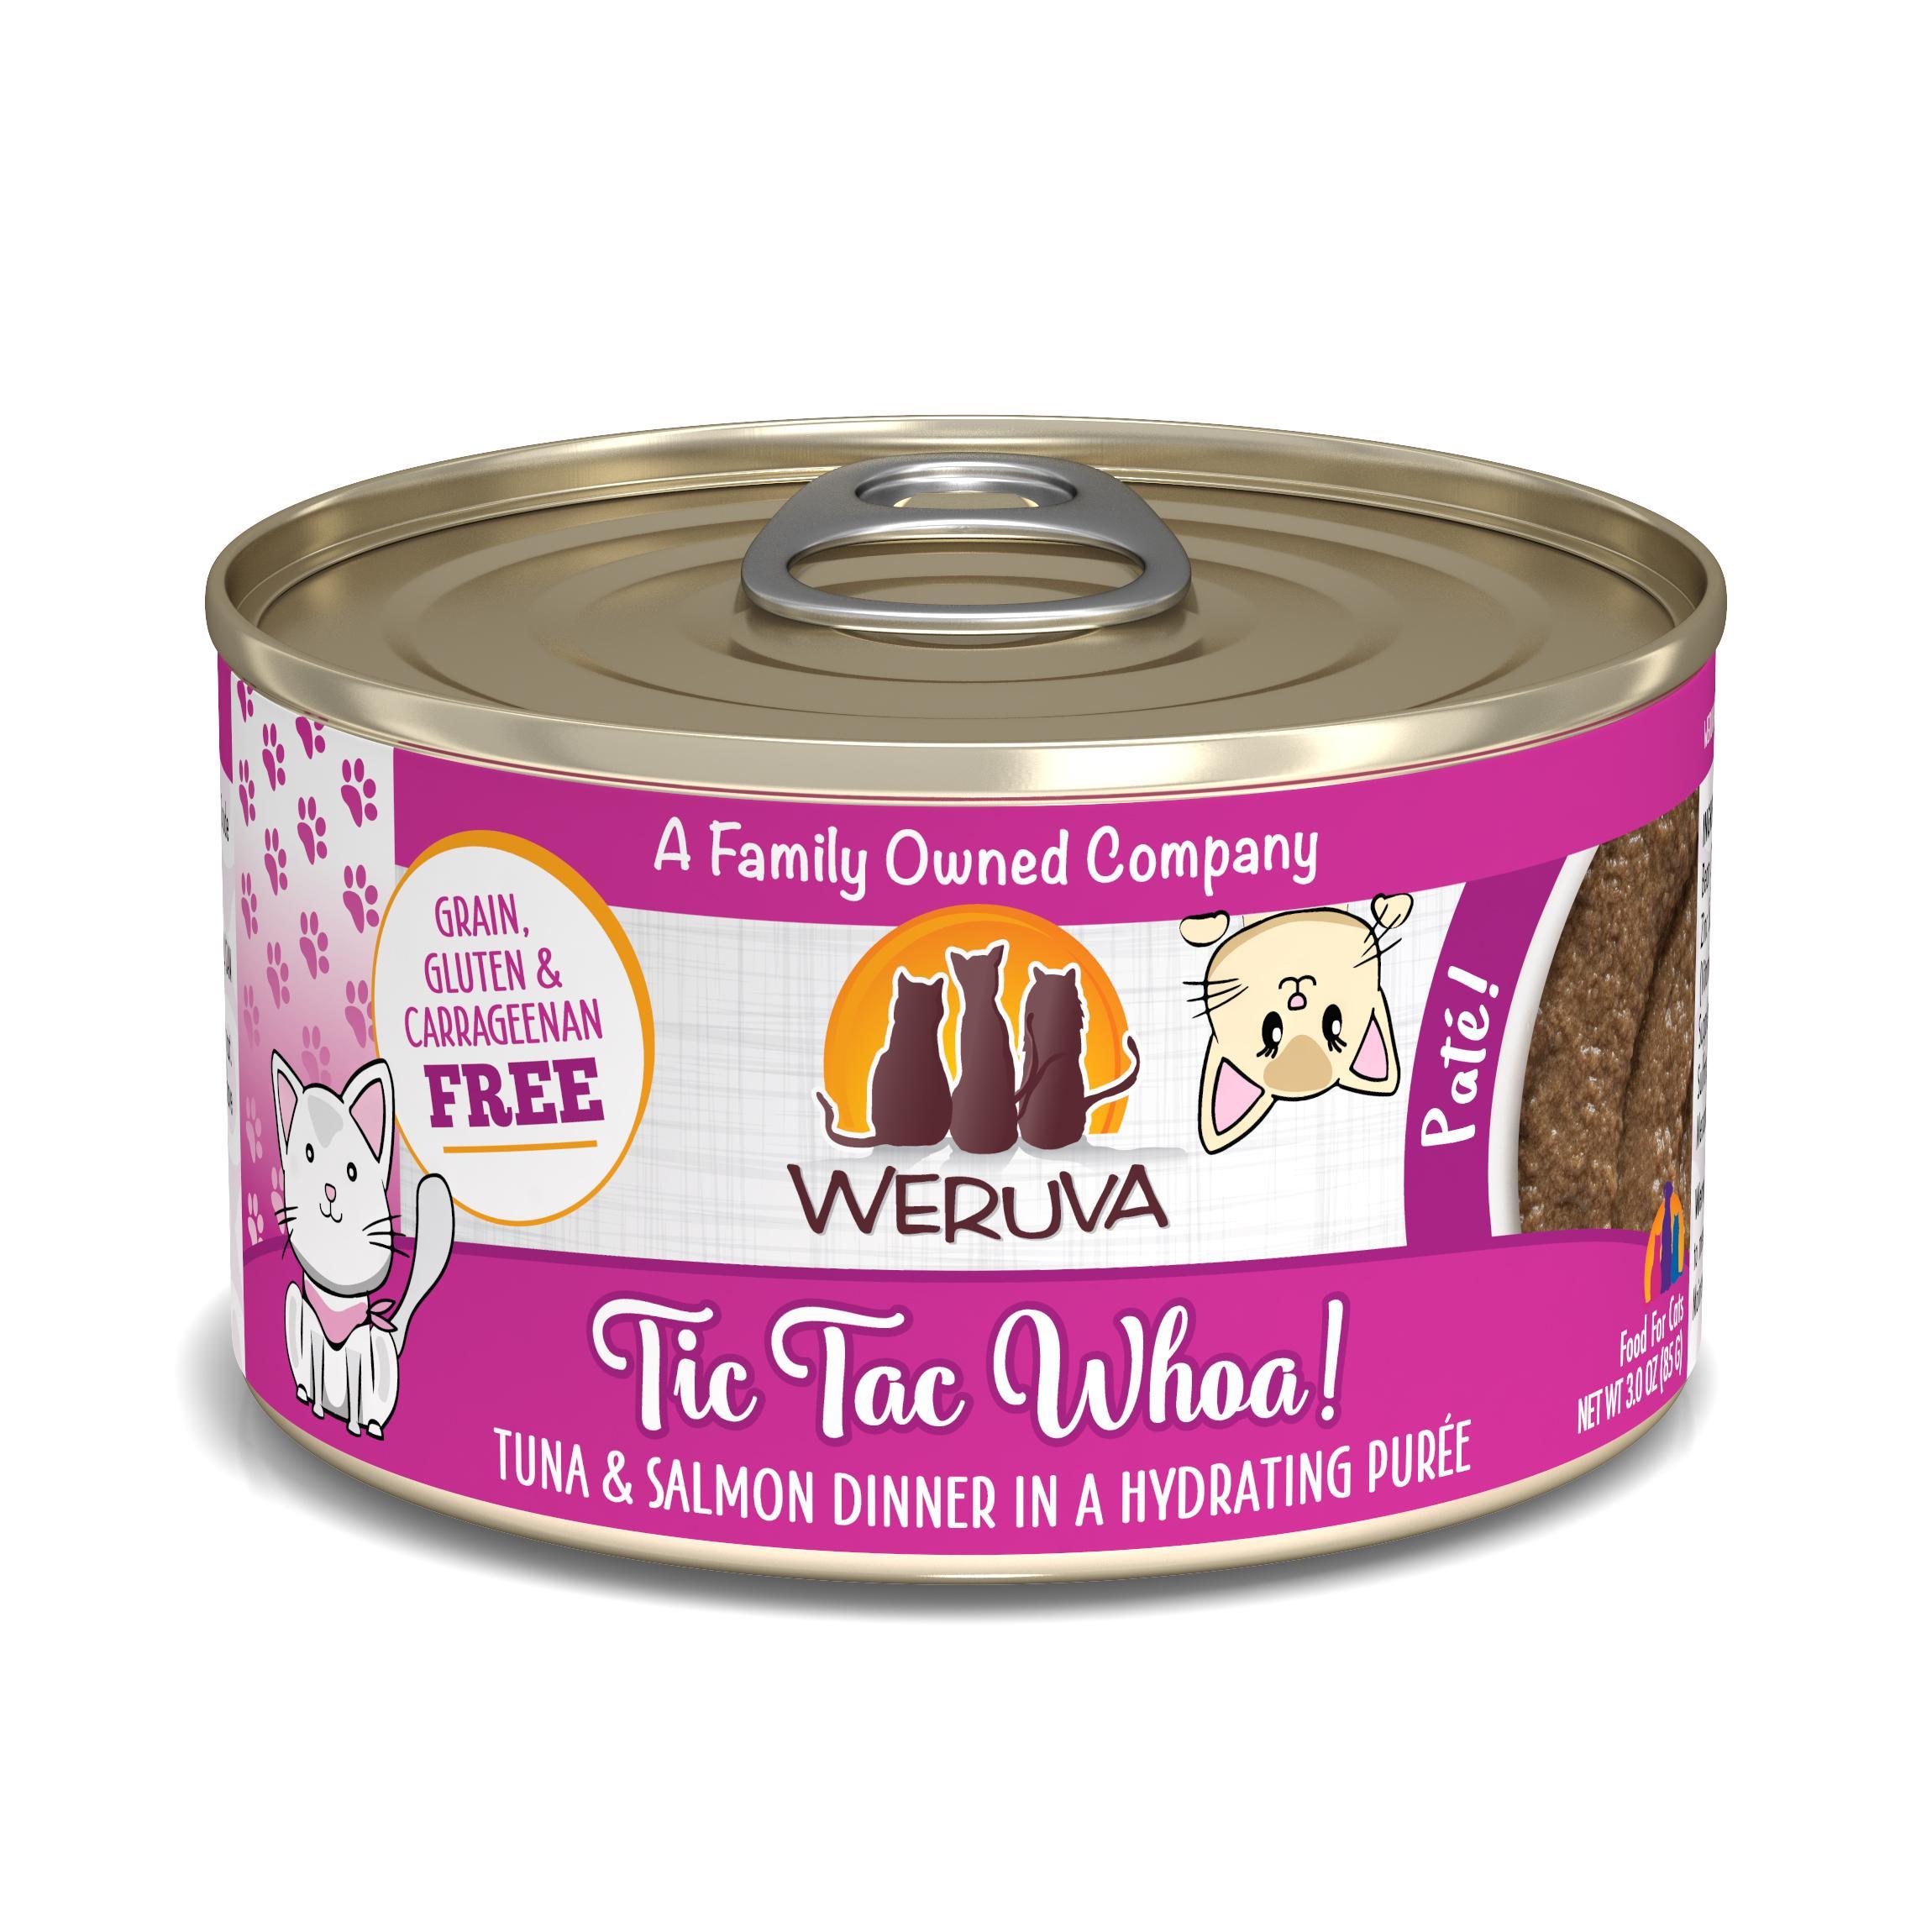 Weruva Cat Pate Tic Tac Whoa! Tuna & Salmon Dinner in Puree Wet Cat Food Image